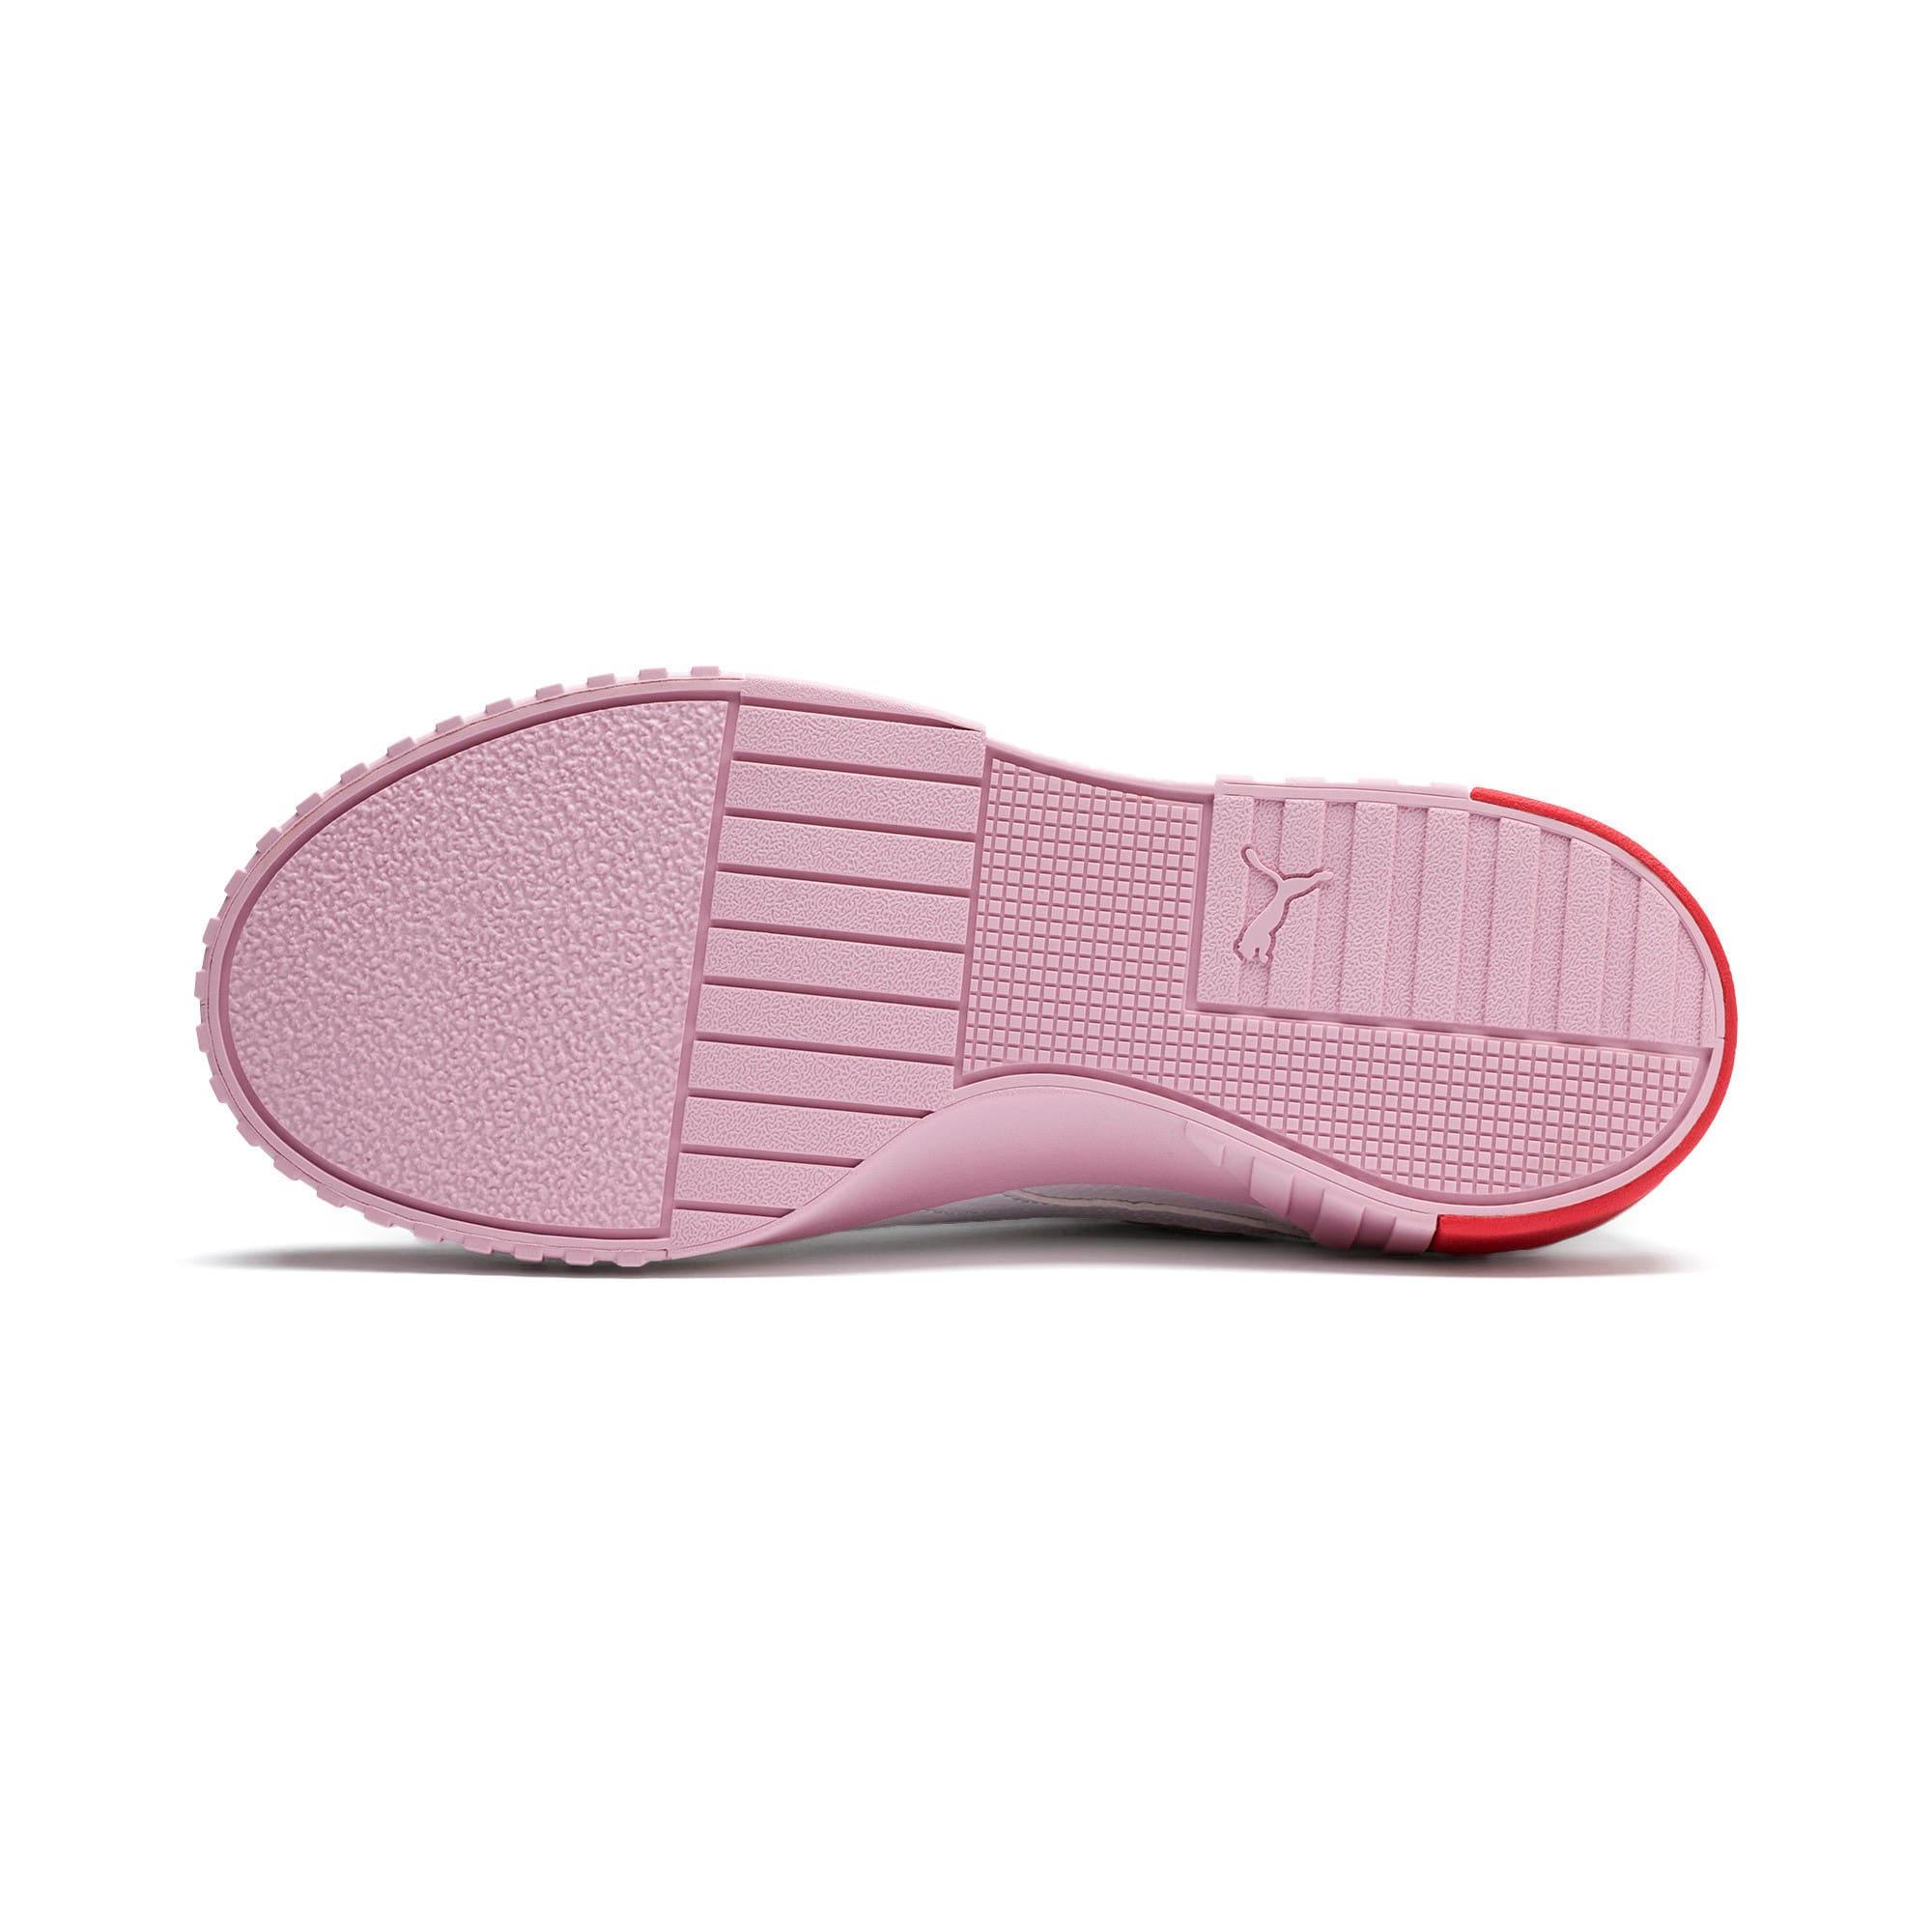 Thumbnail 5 of Basket Cali pour femme, Puma White-Pale Pink, medium